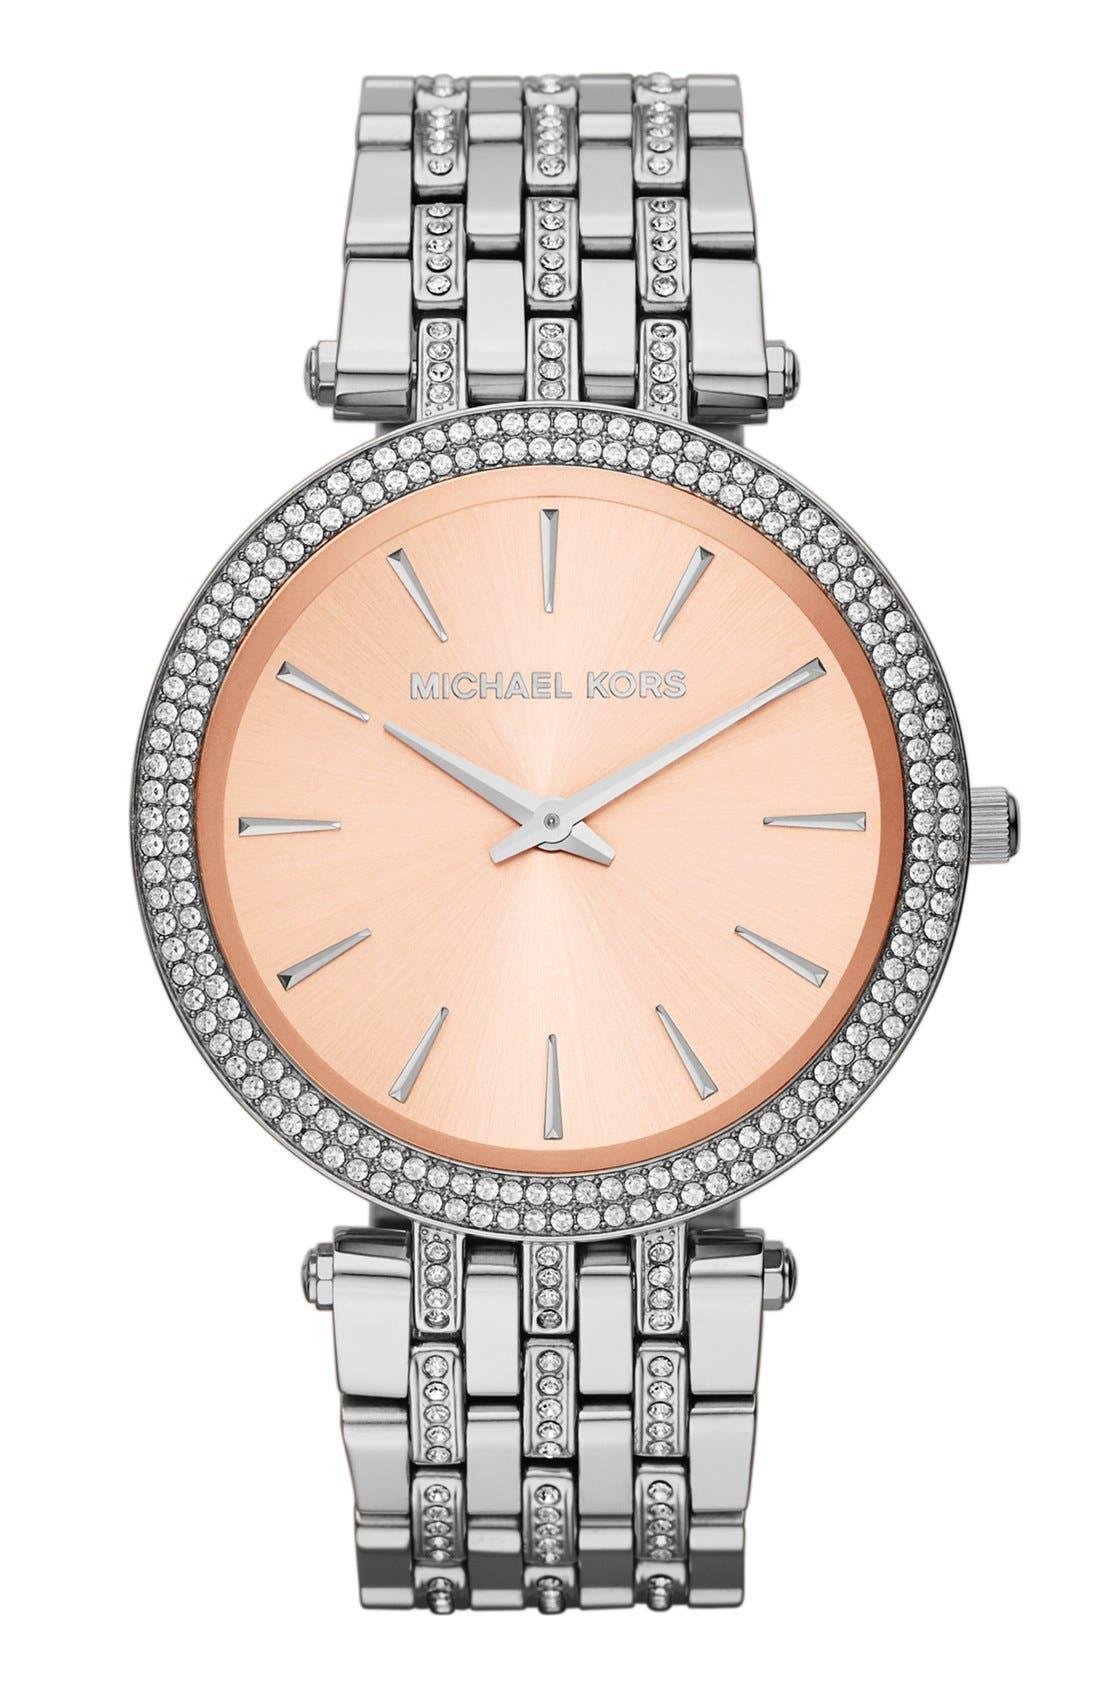 Main Image - Michael Kors 'Darci' Crystal Bezel Bracelet Watch, 39mm